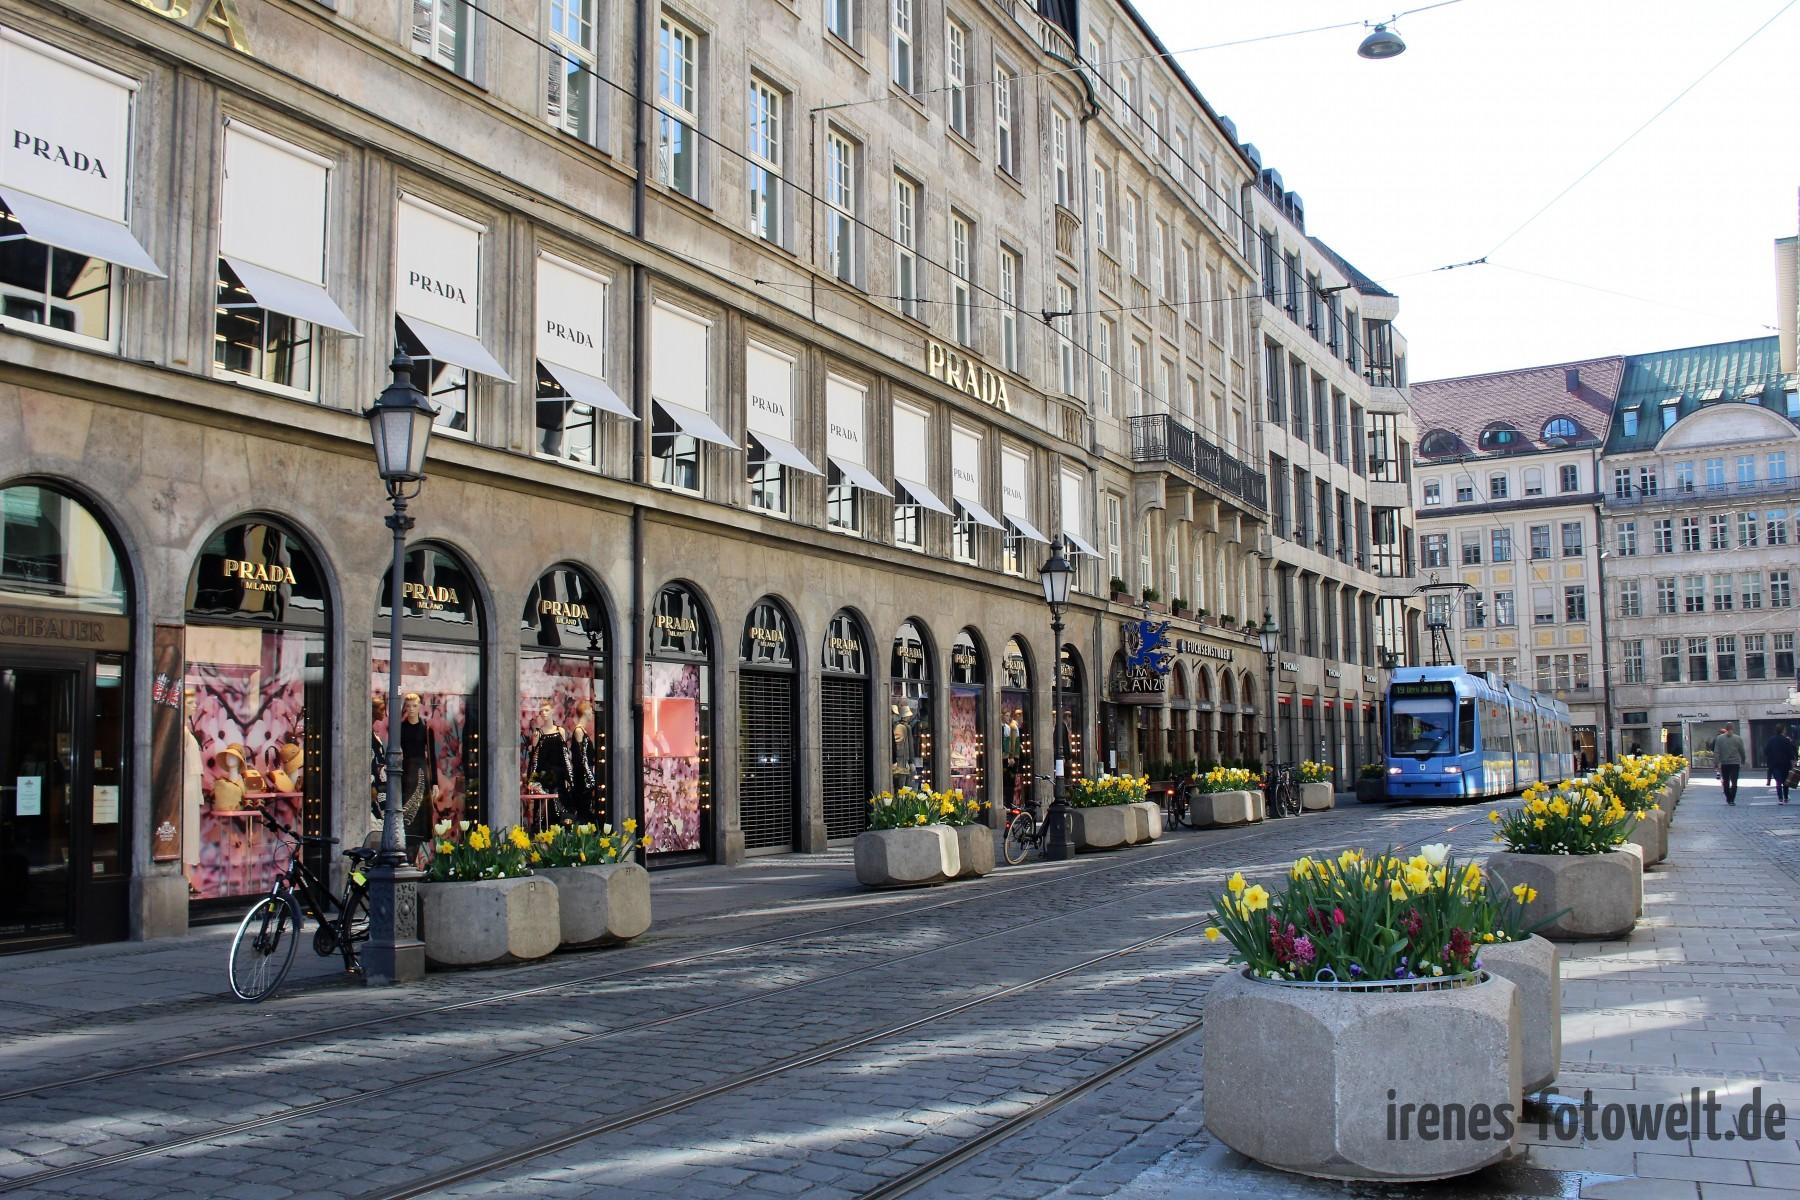 Perusastraße